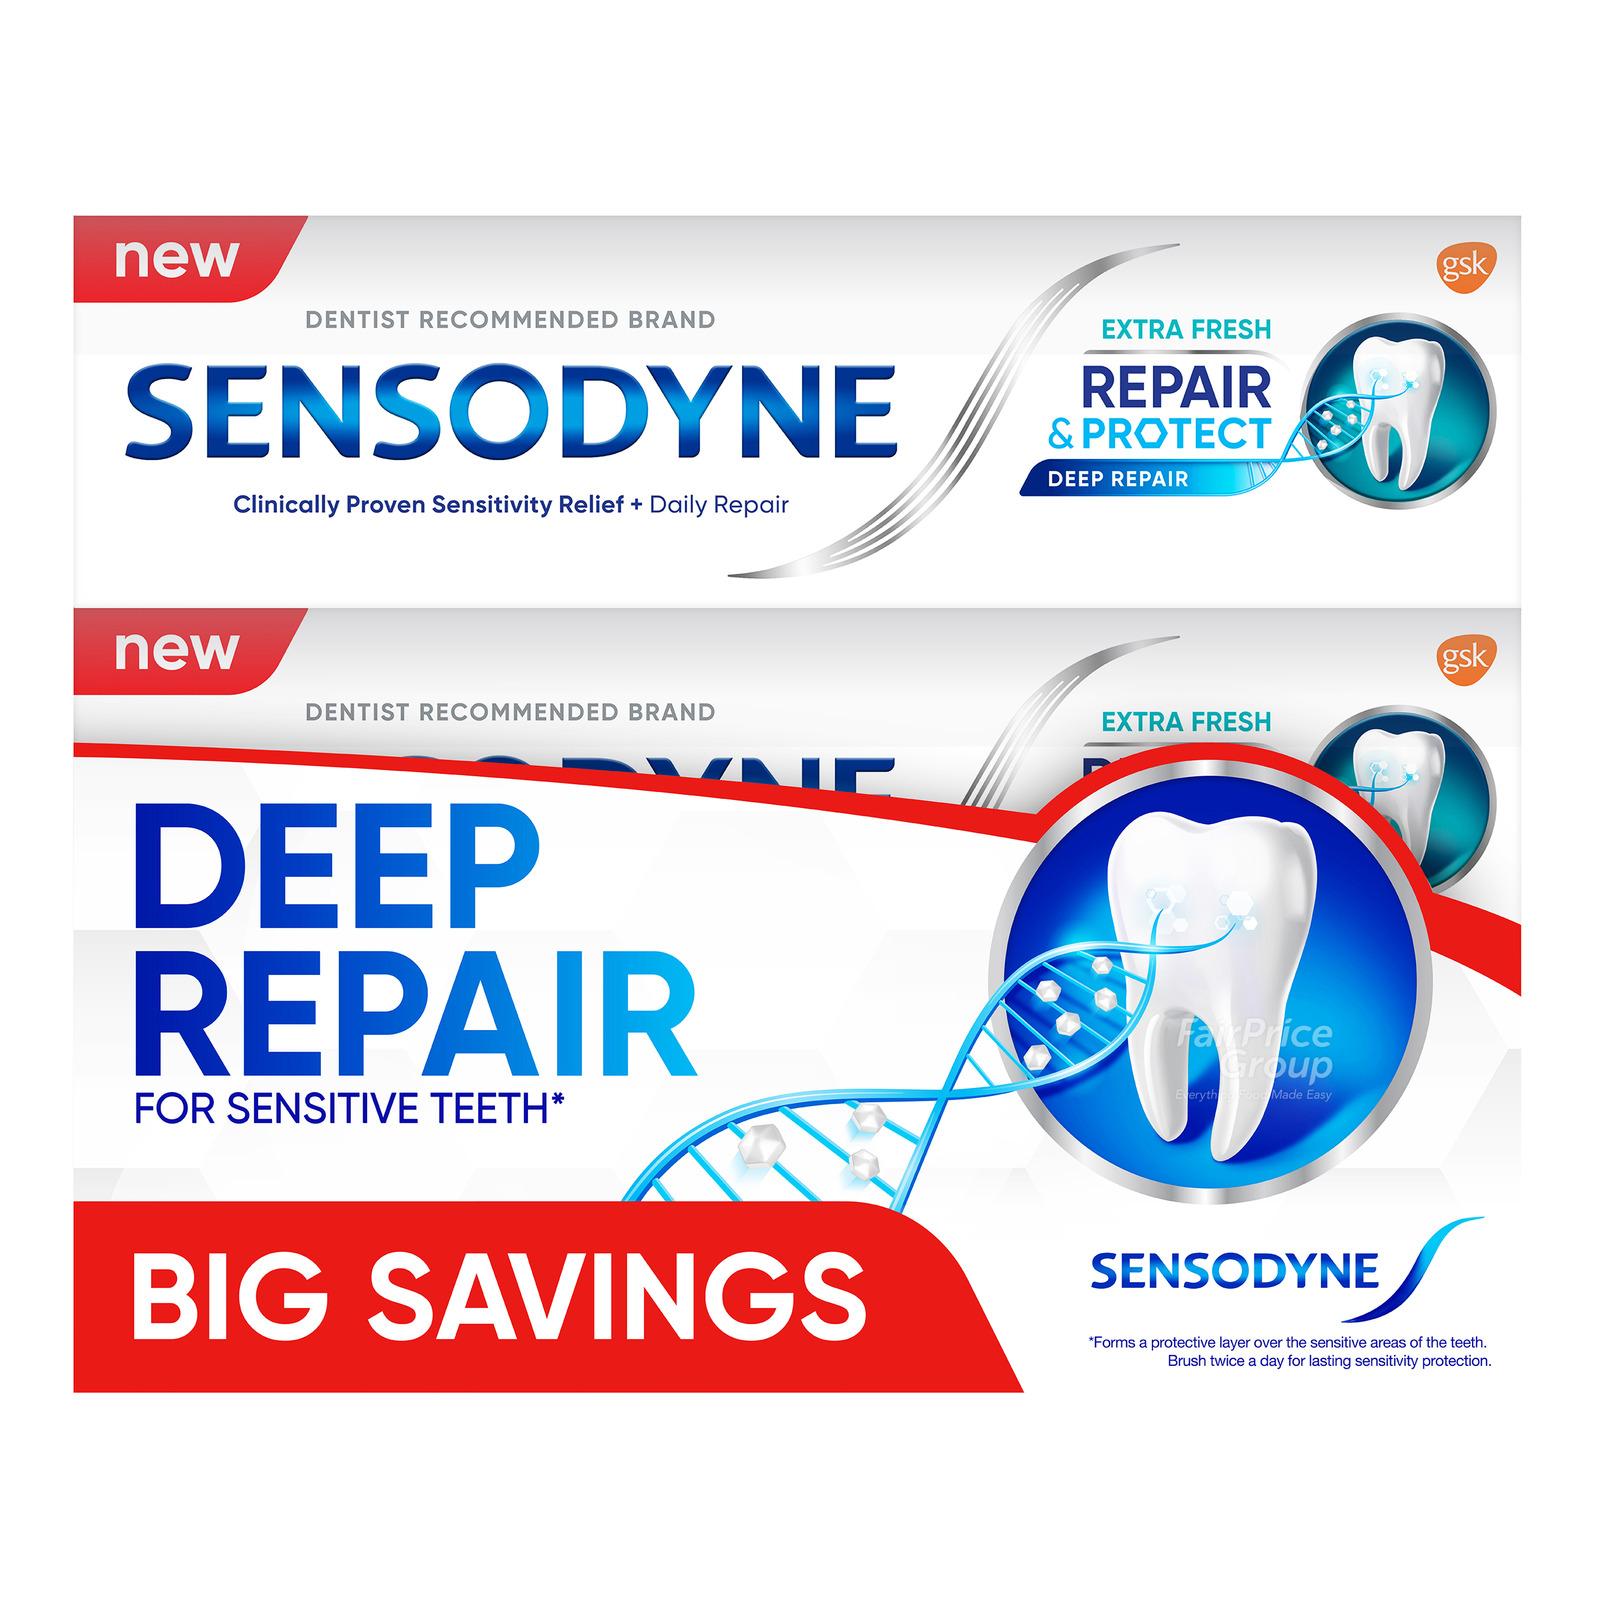 Sensodyne Toothpaste - Repair & Protect (Extra Fresh)